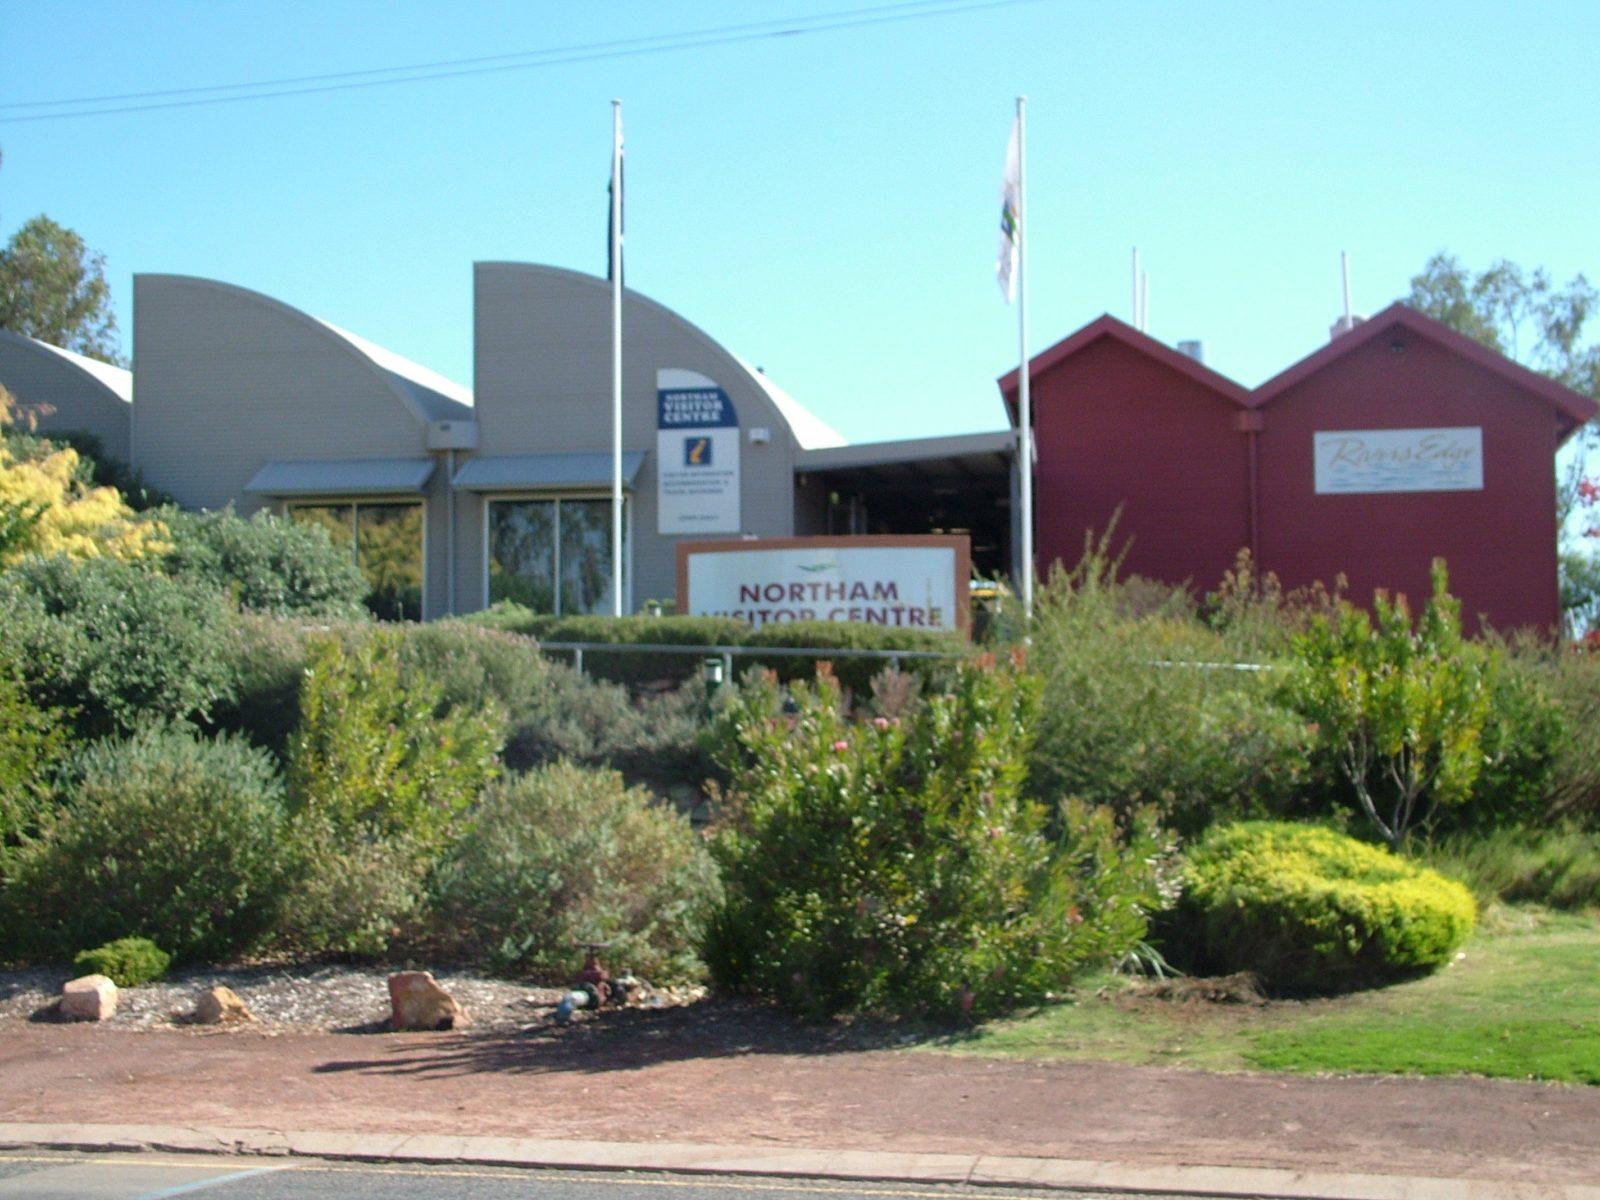 Northam Visitor Centre, Northam, Western Australia